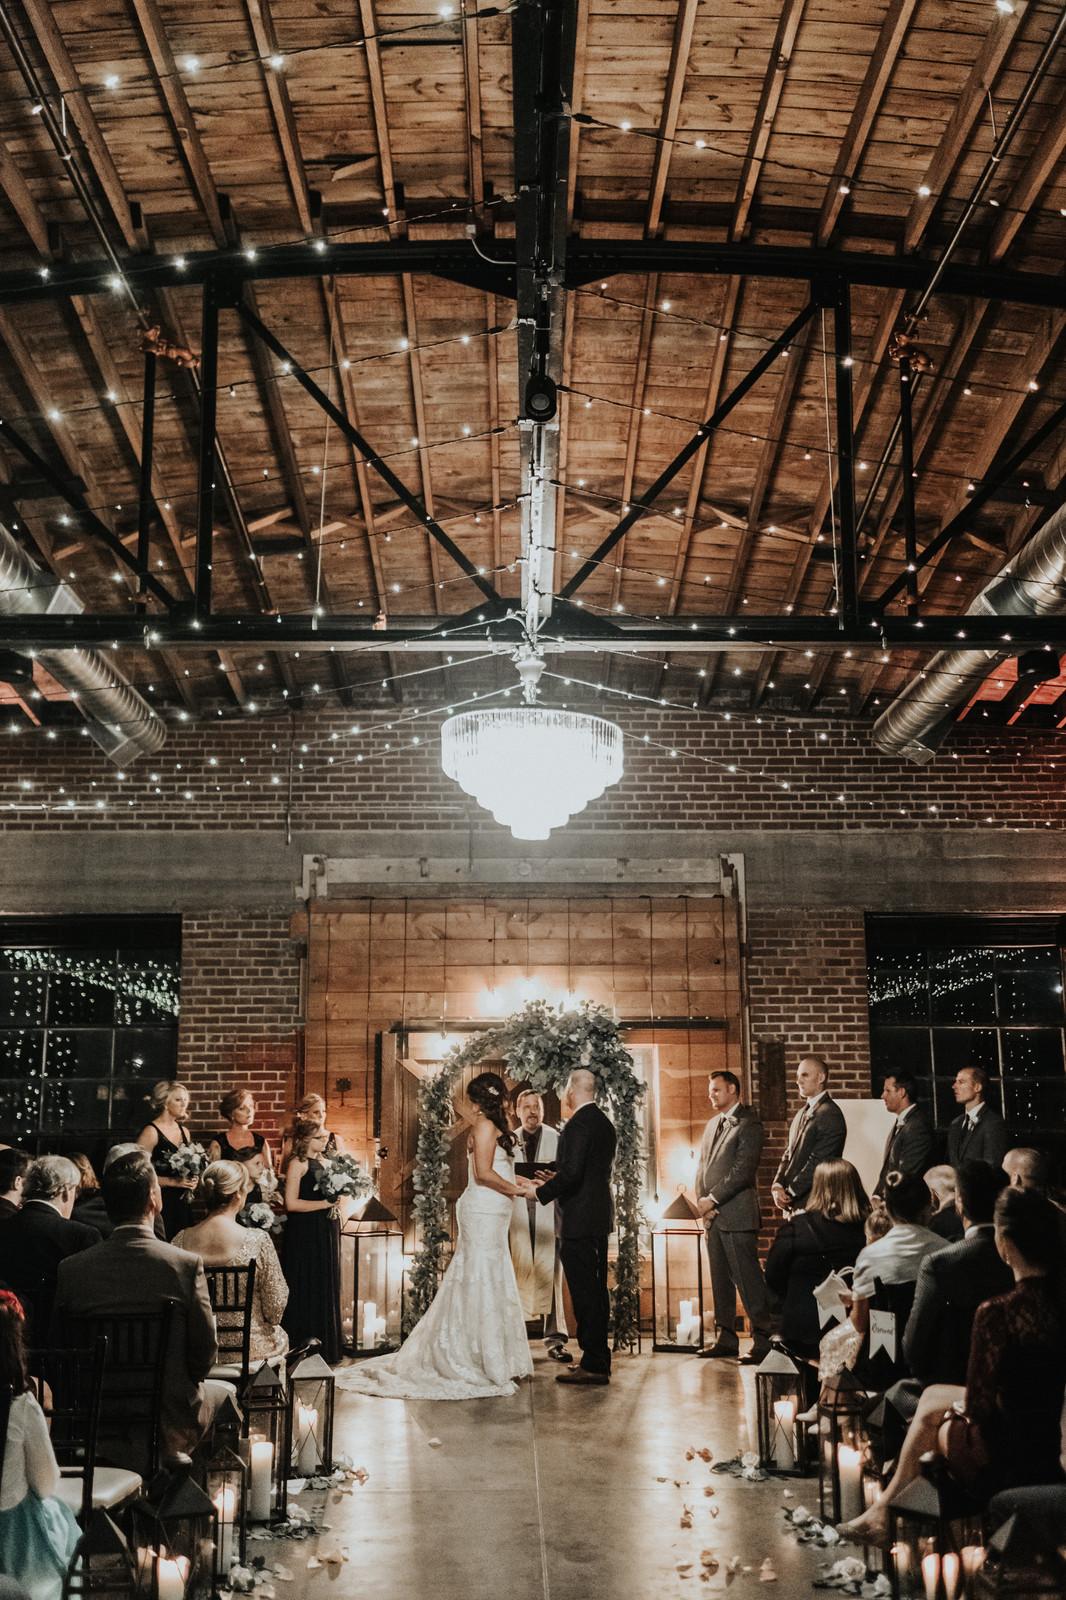 The Hudson Wichita Wedding Venue Wedding Reception Event Space